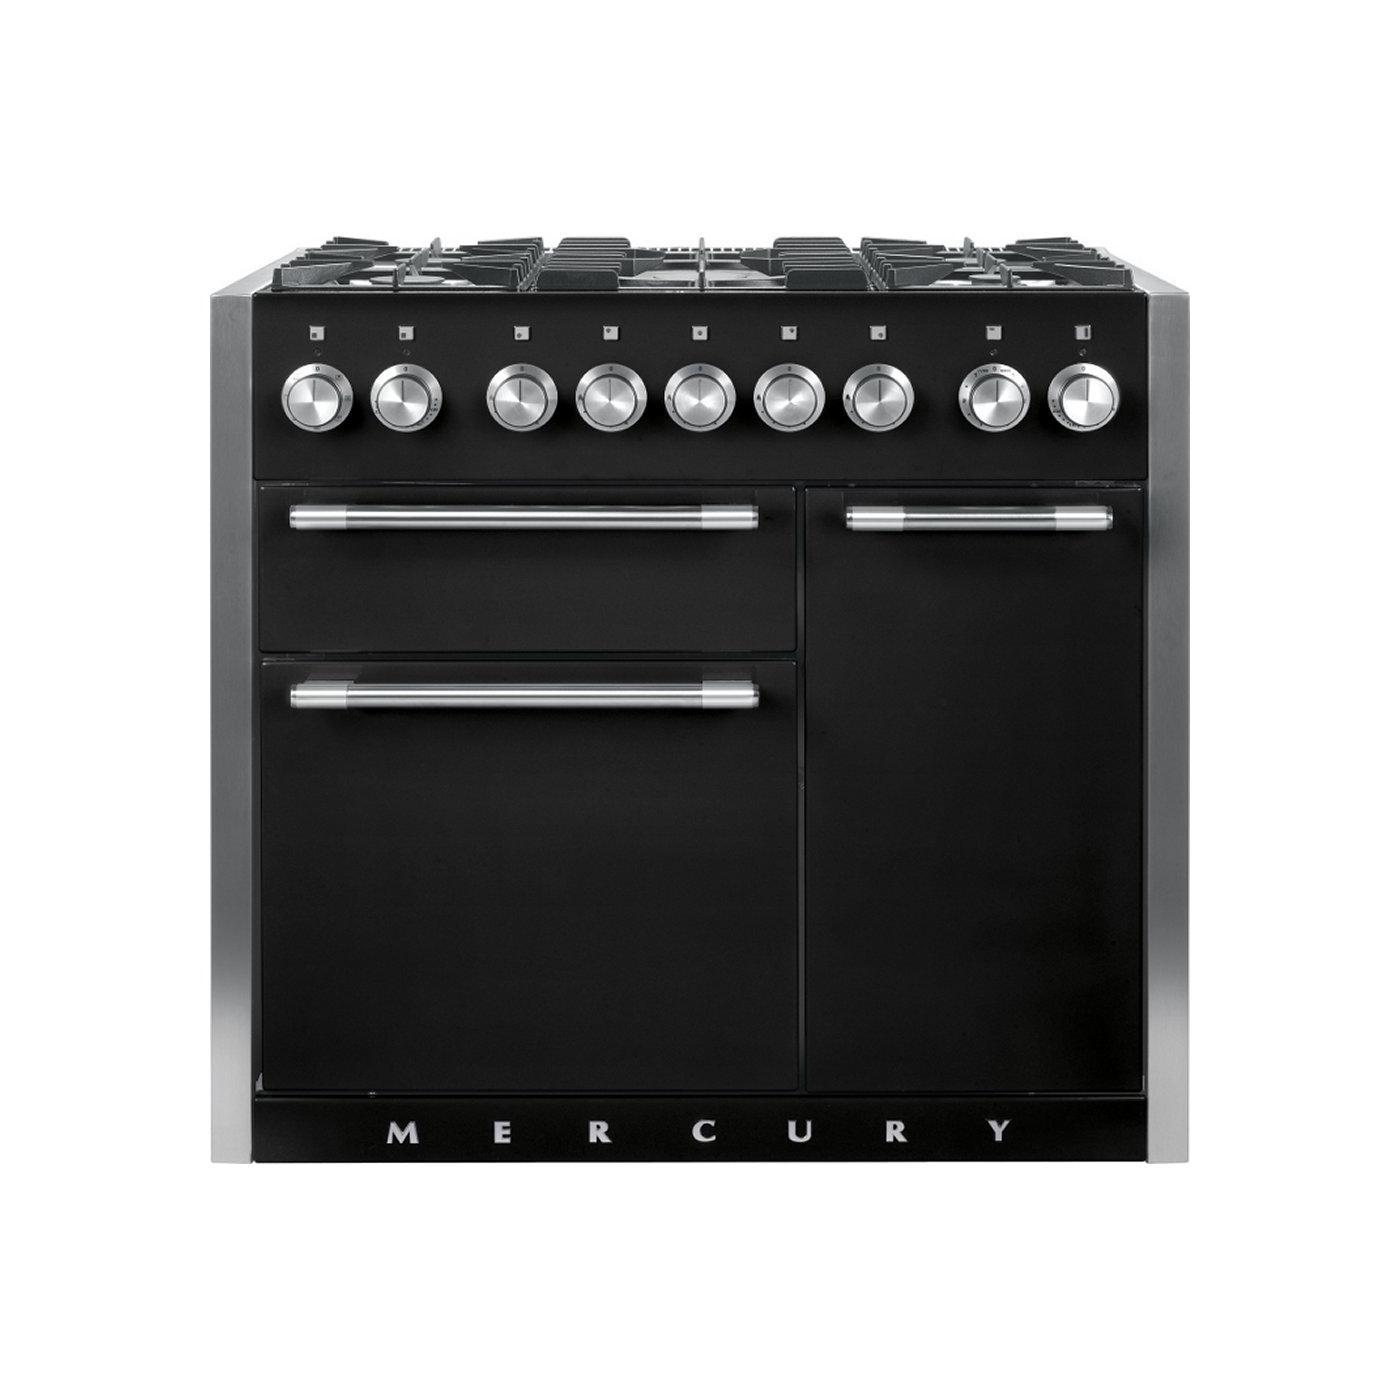 MCY1000DFAB 93130 100cm Dual Fuel Range Cooker